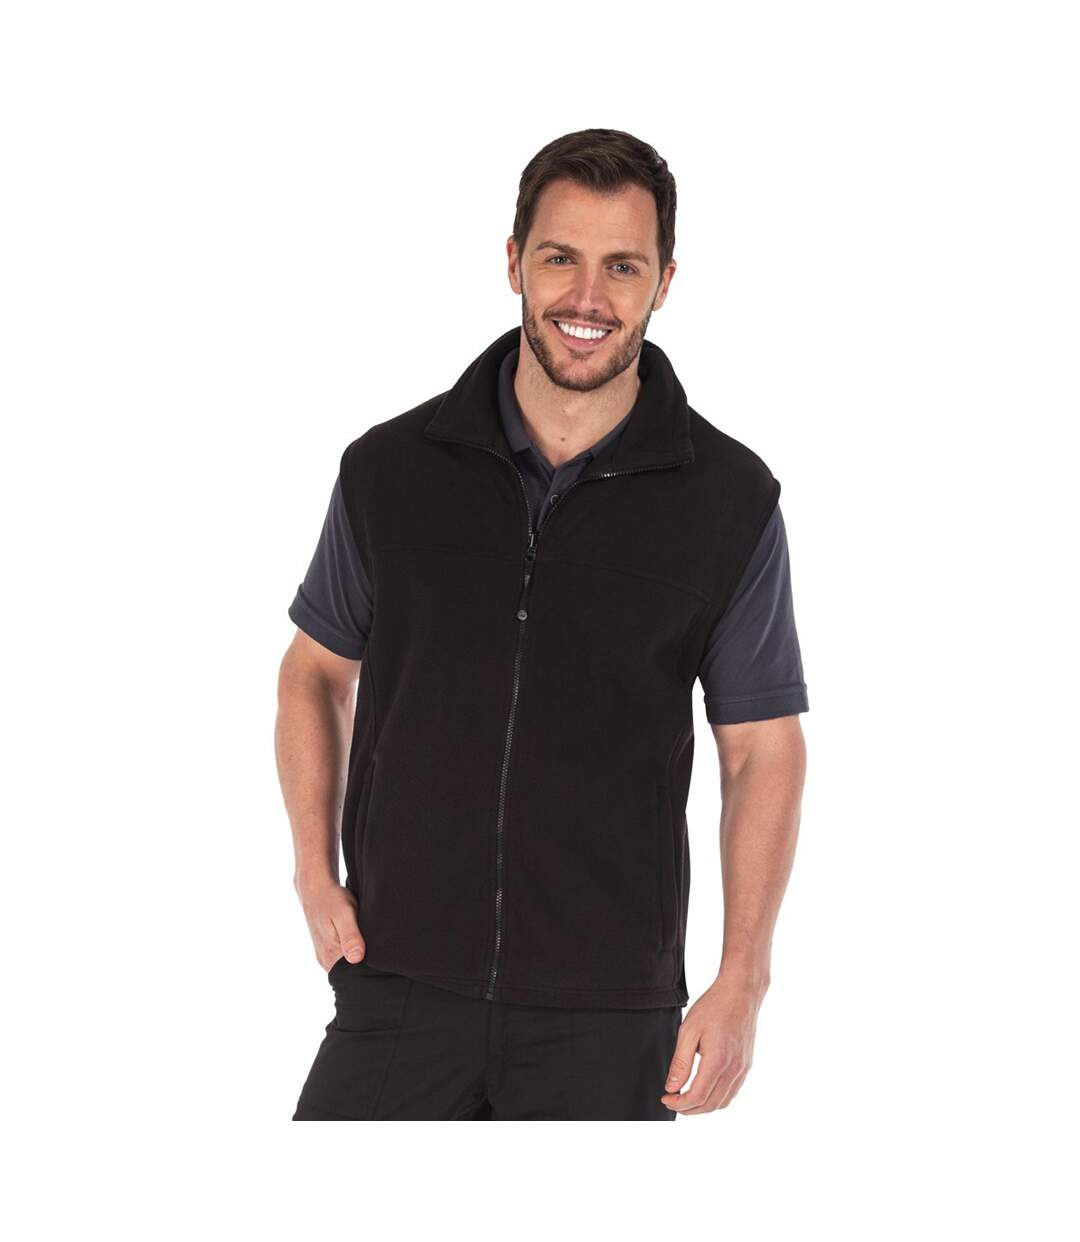 Regatta Haber II Full-Zip Bodywarmer Fleece Anti-Pill Jacket (250 GSM) (Black) - UTBC819